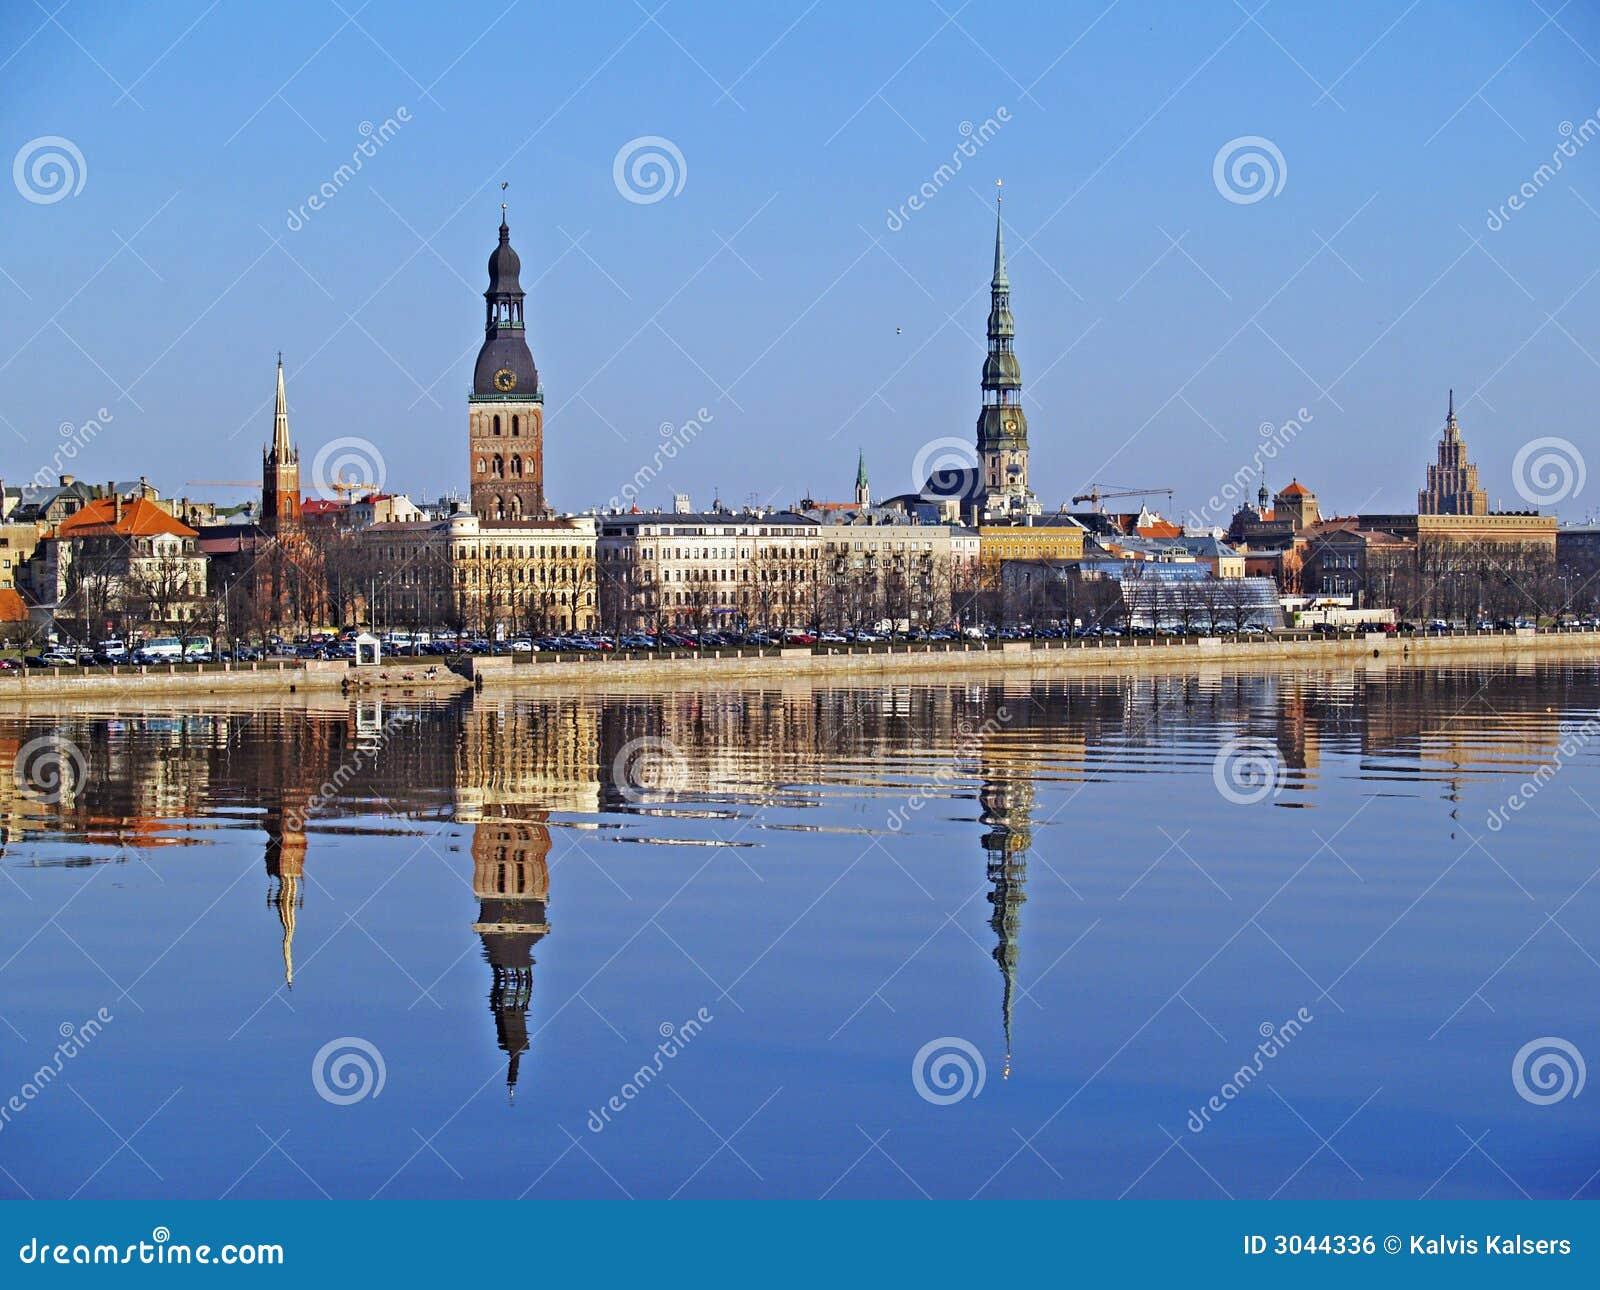 Old Riga across the Daugava